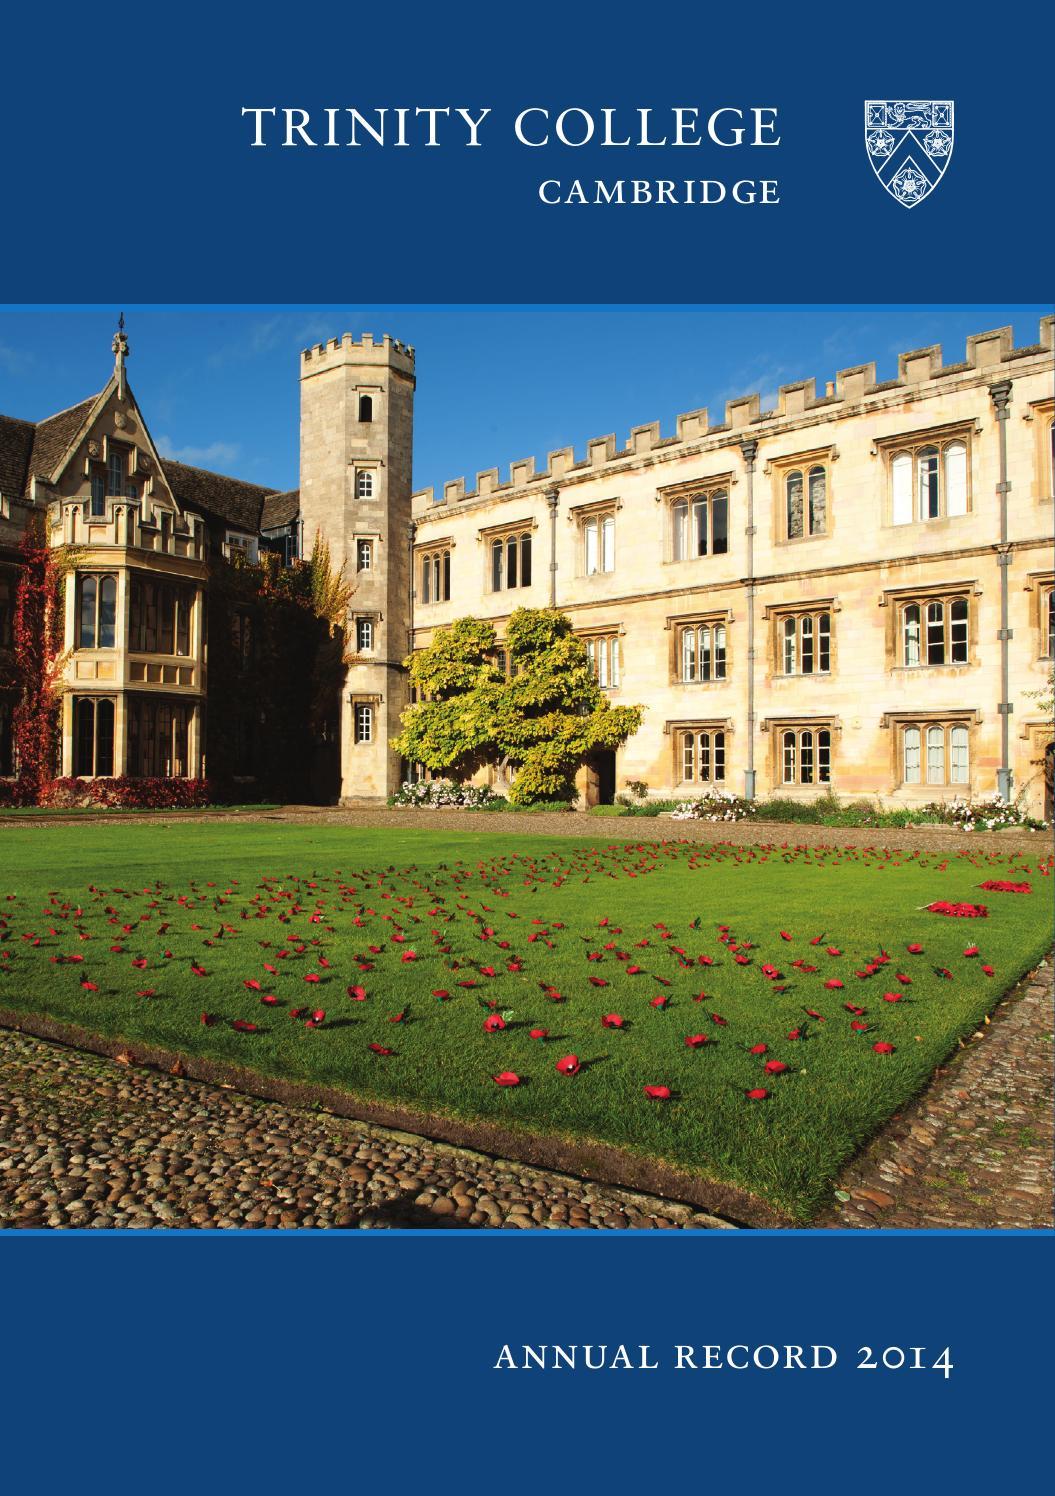 c64970a87333 Annual Record 2014 by Trinity College Cambridge - issuu